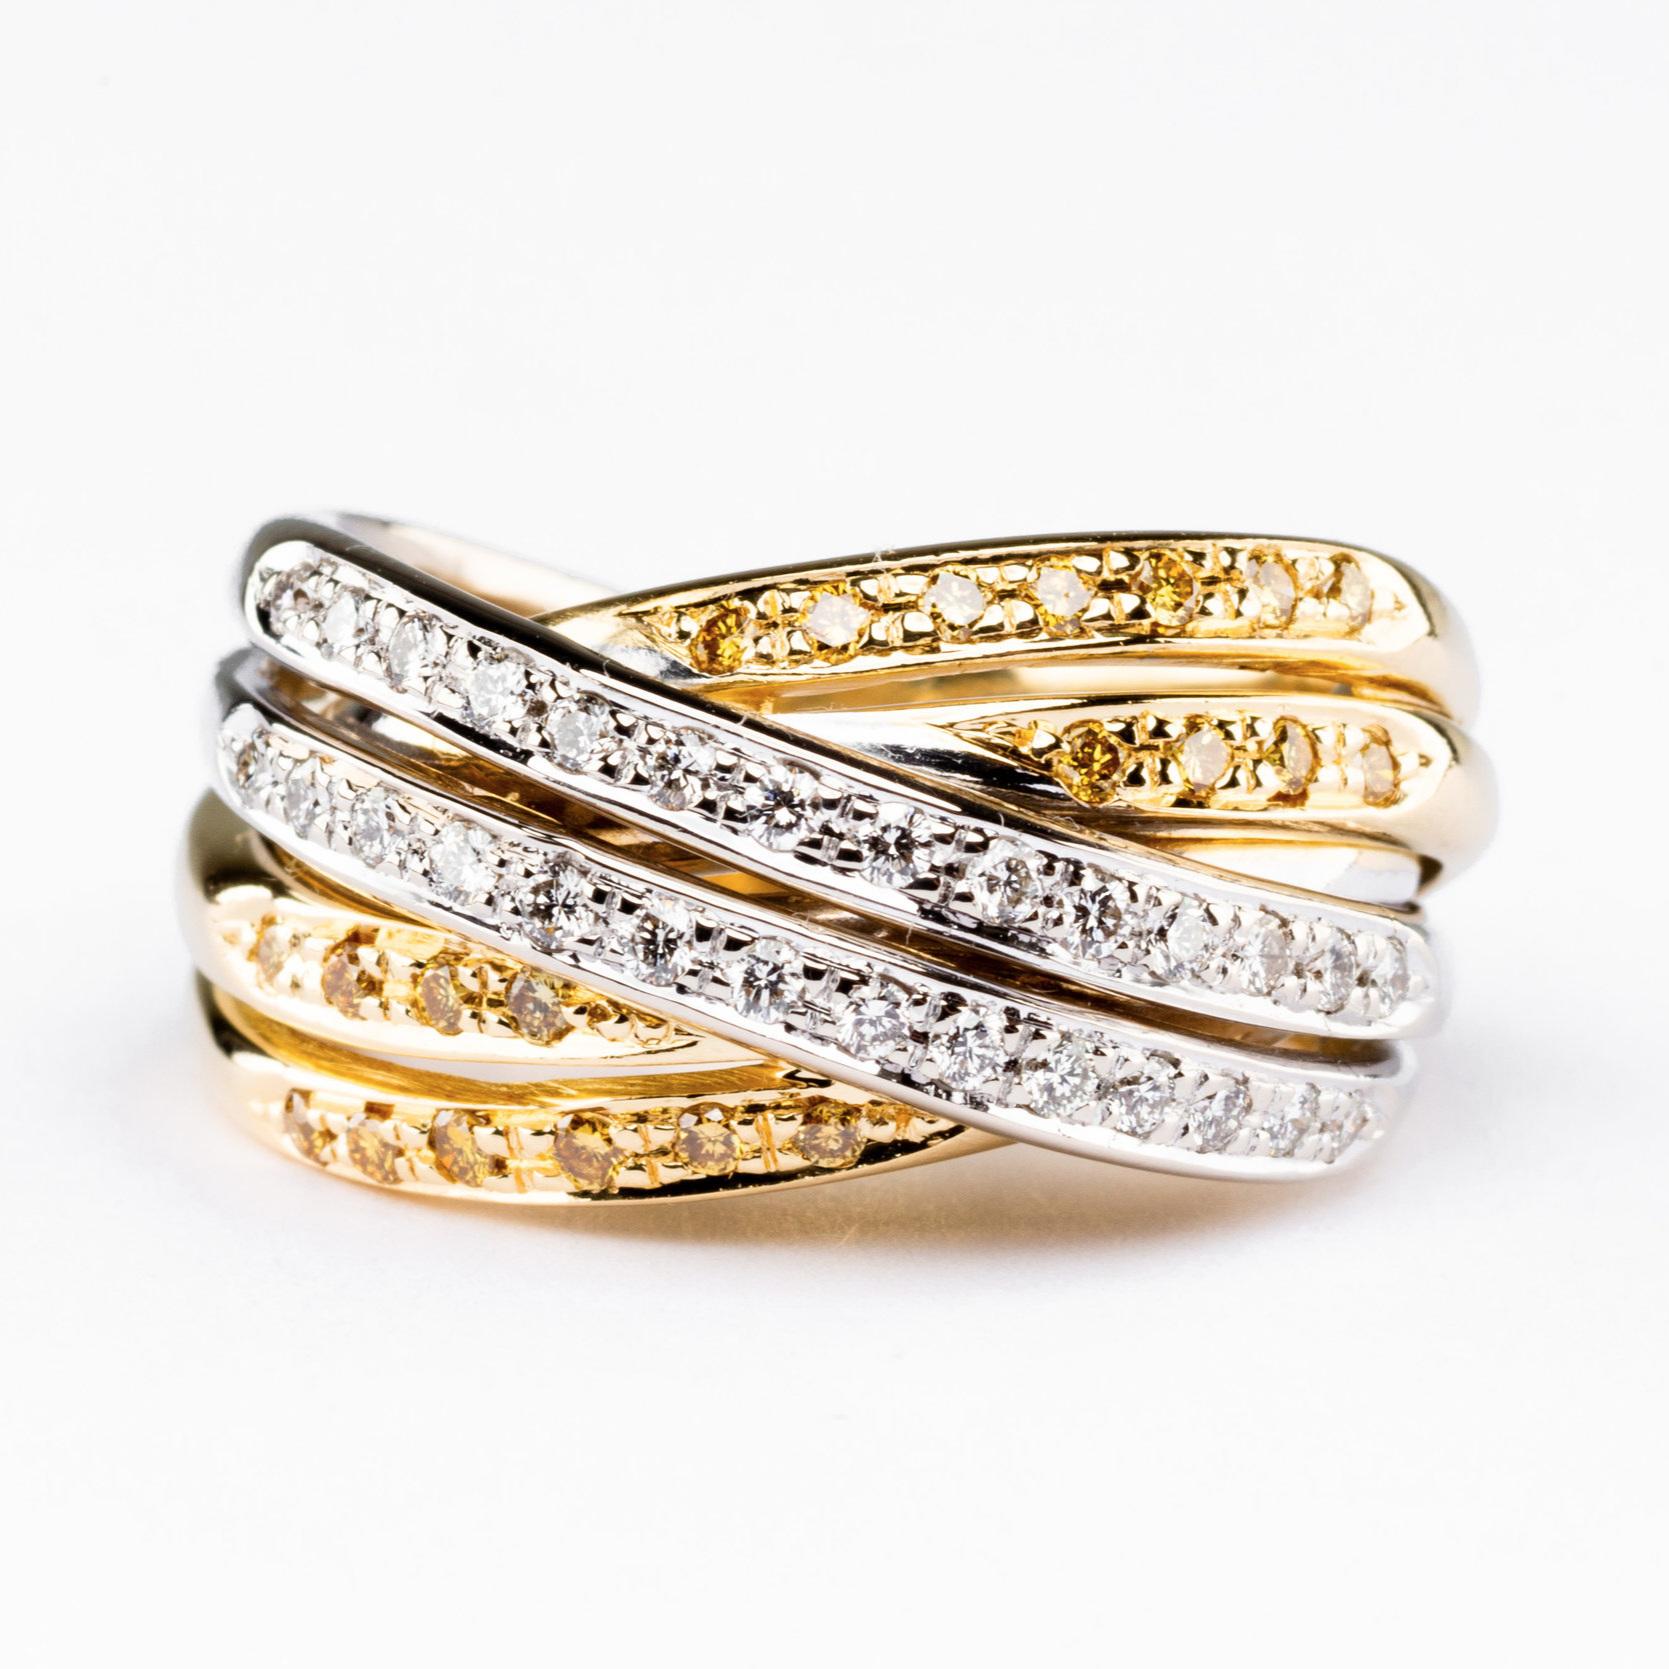 Gold & Silver Diamond Ring